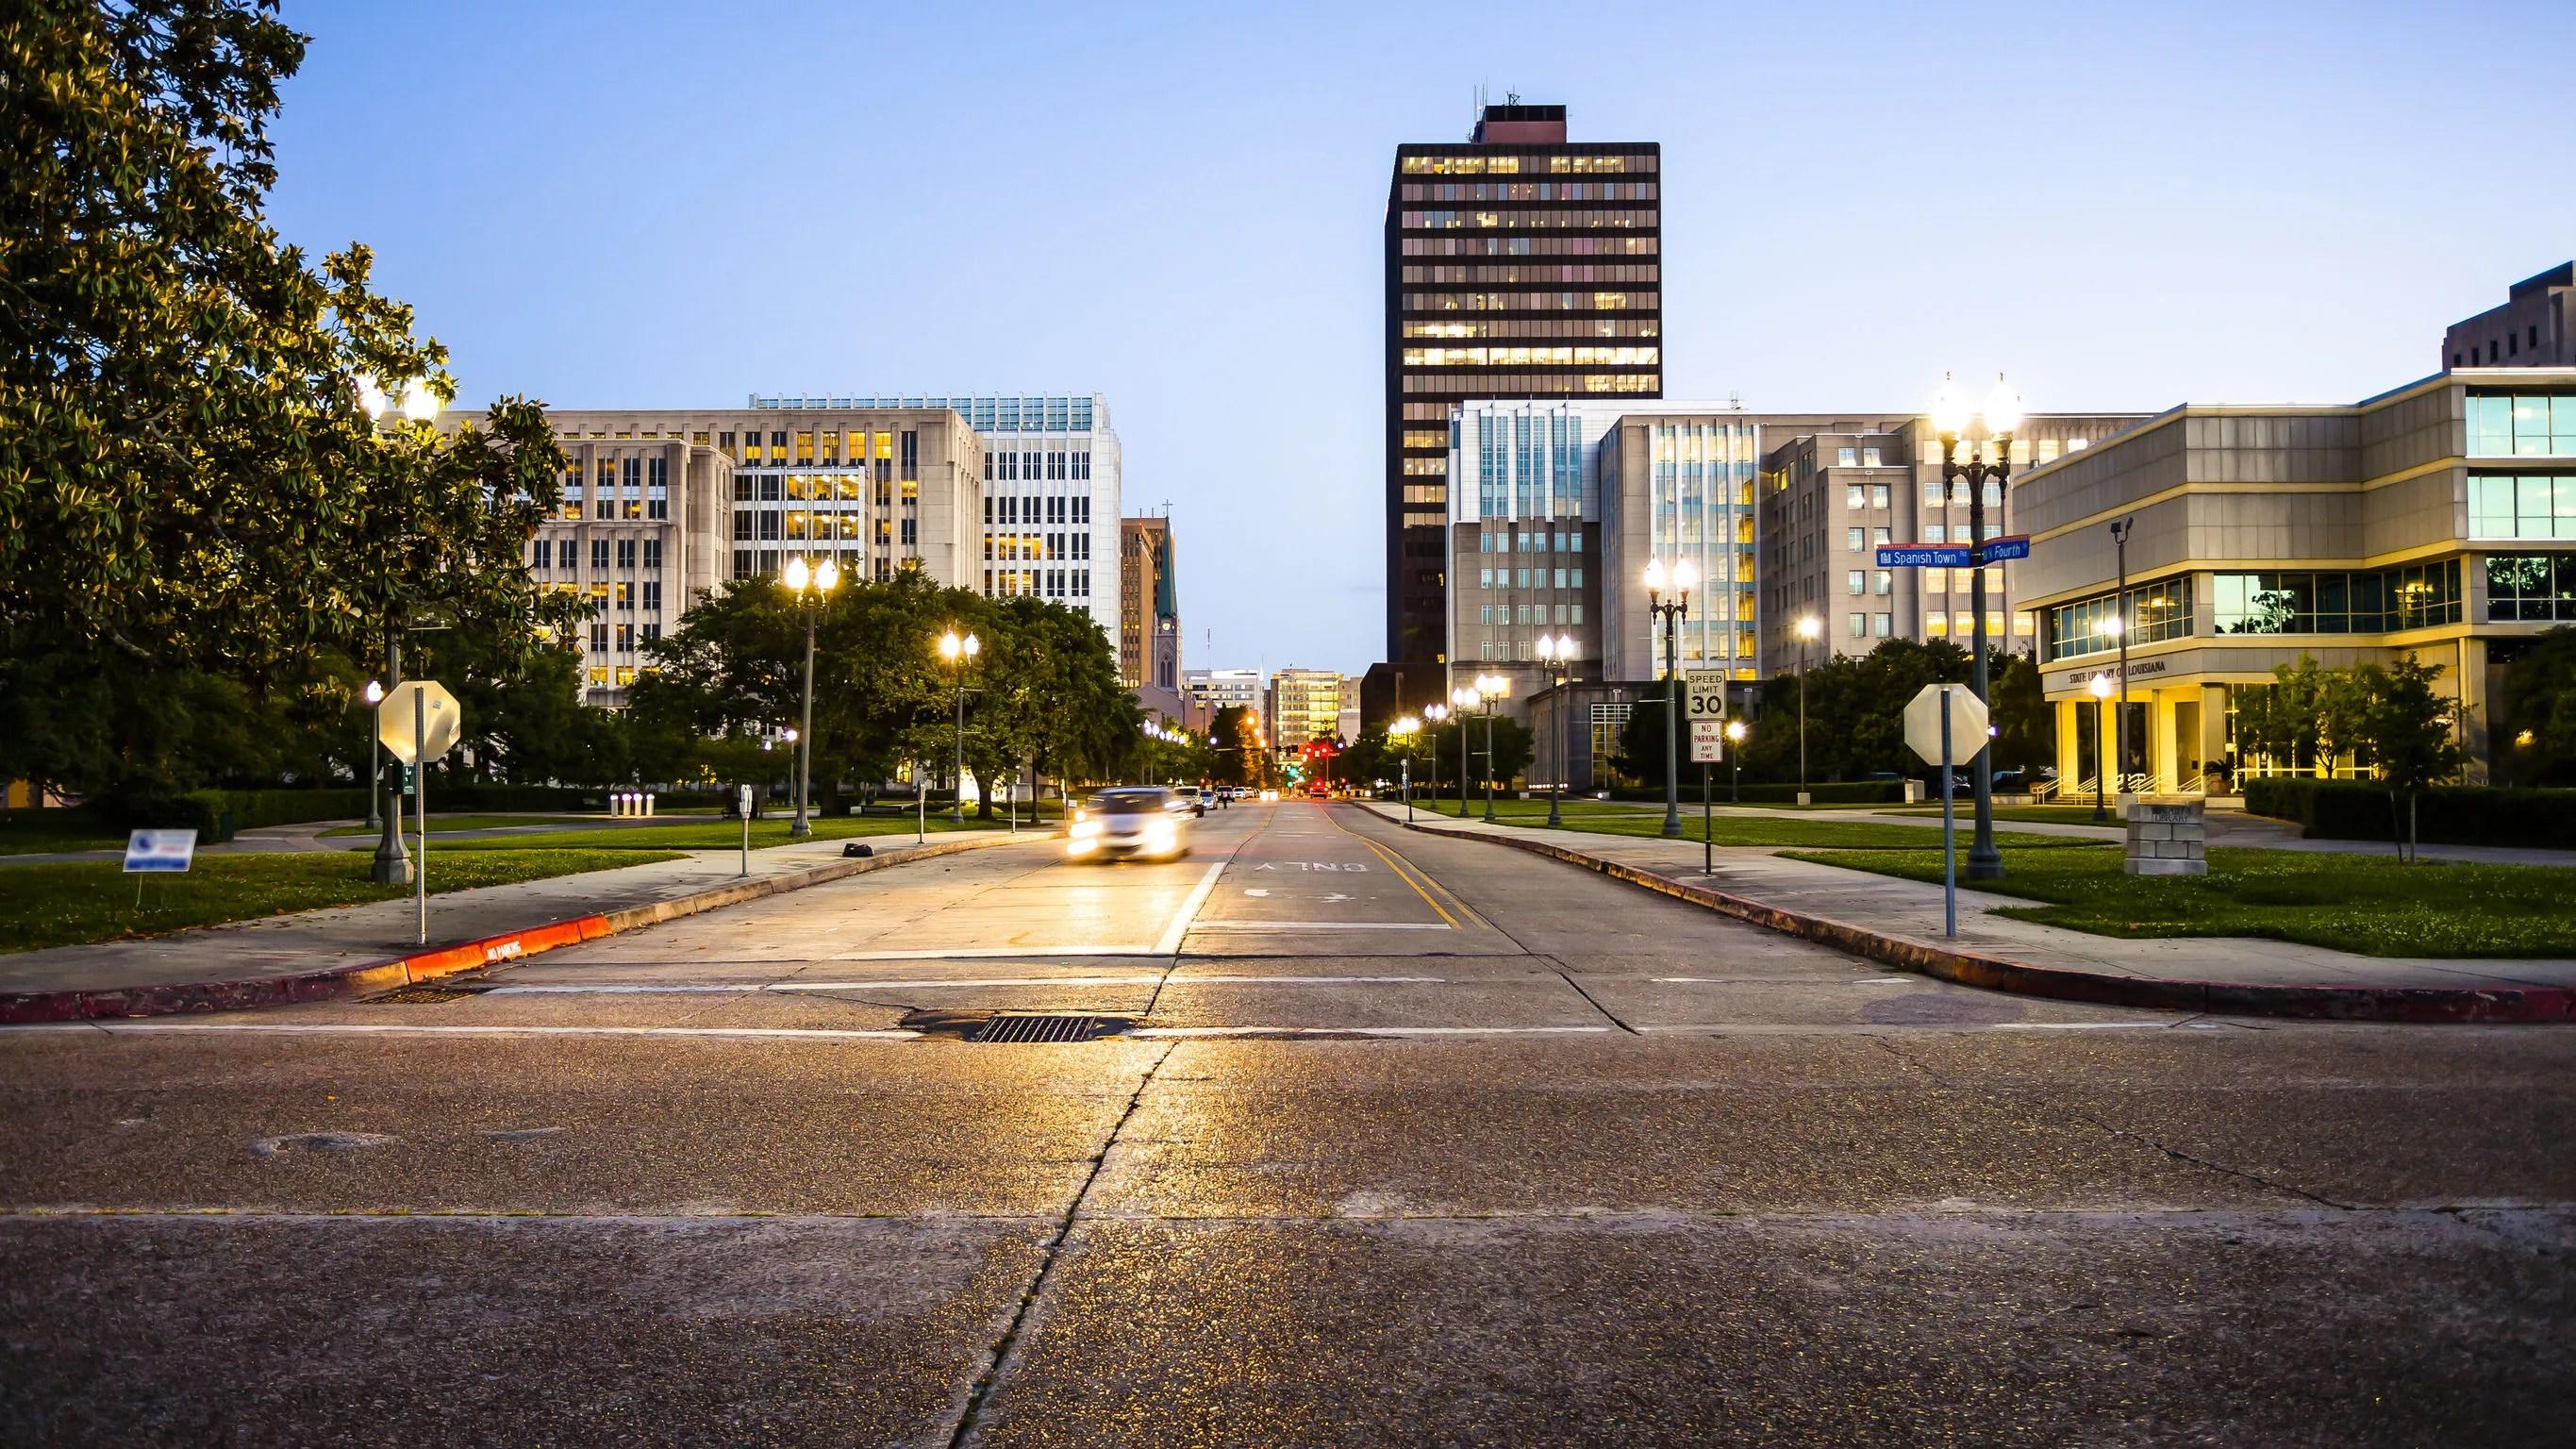 Baton Rouge, LA street